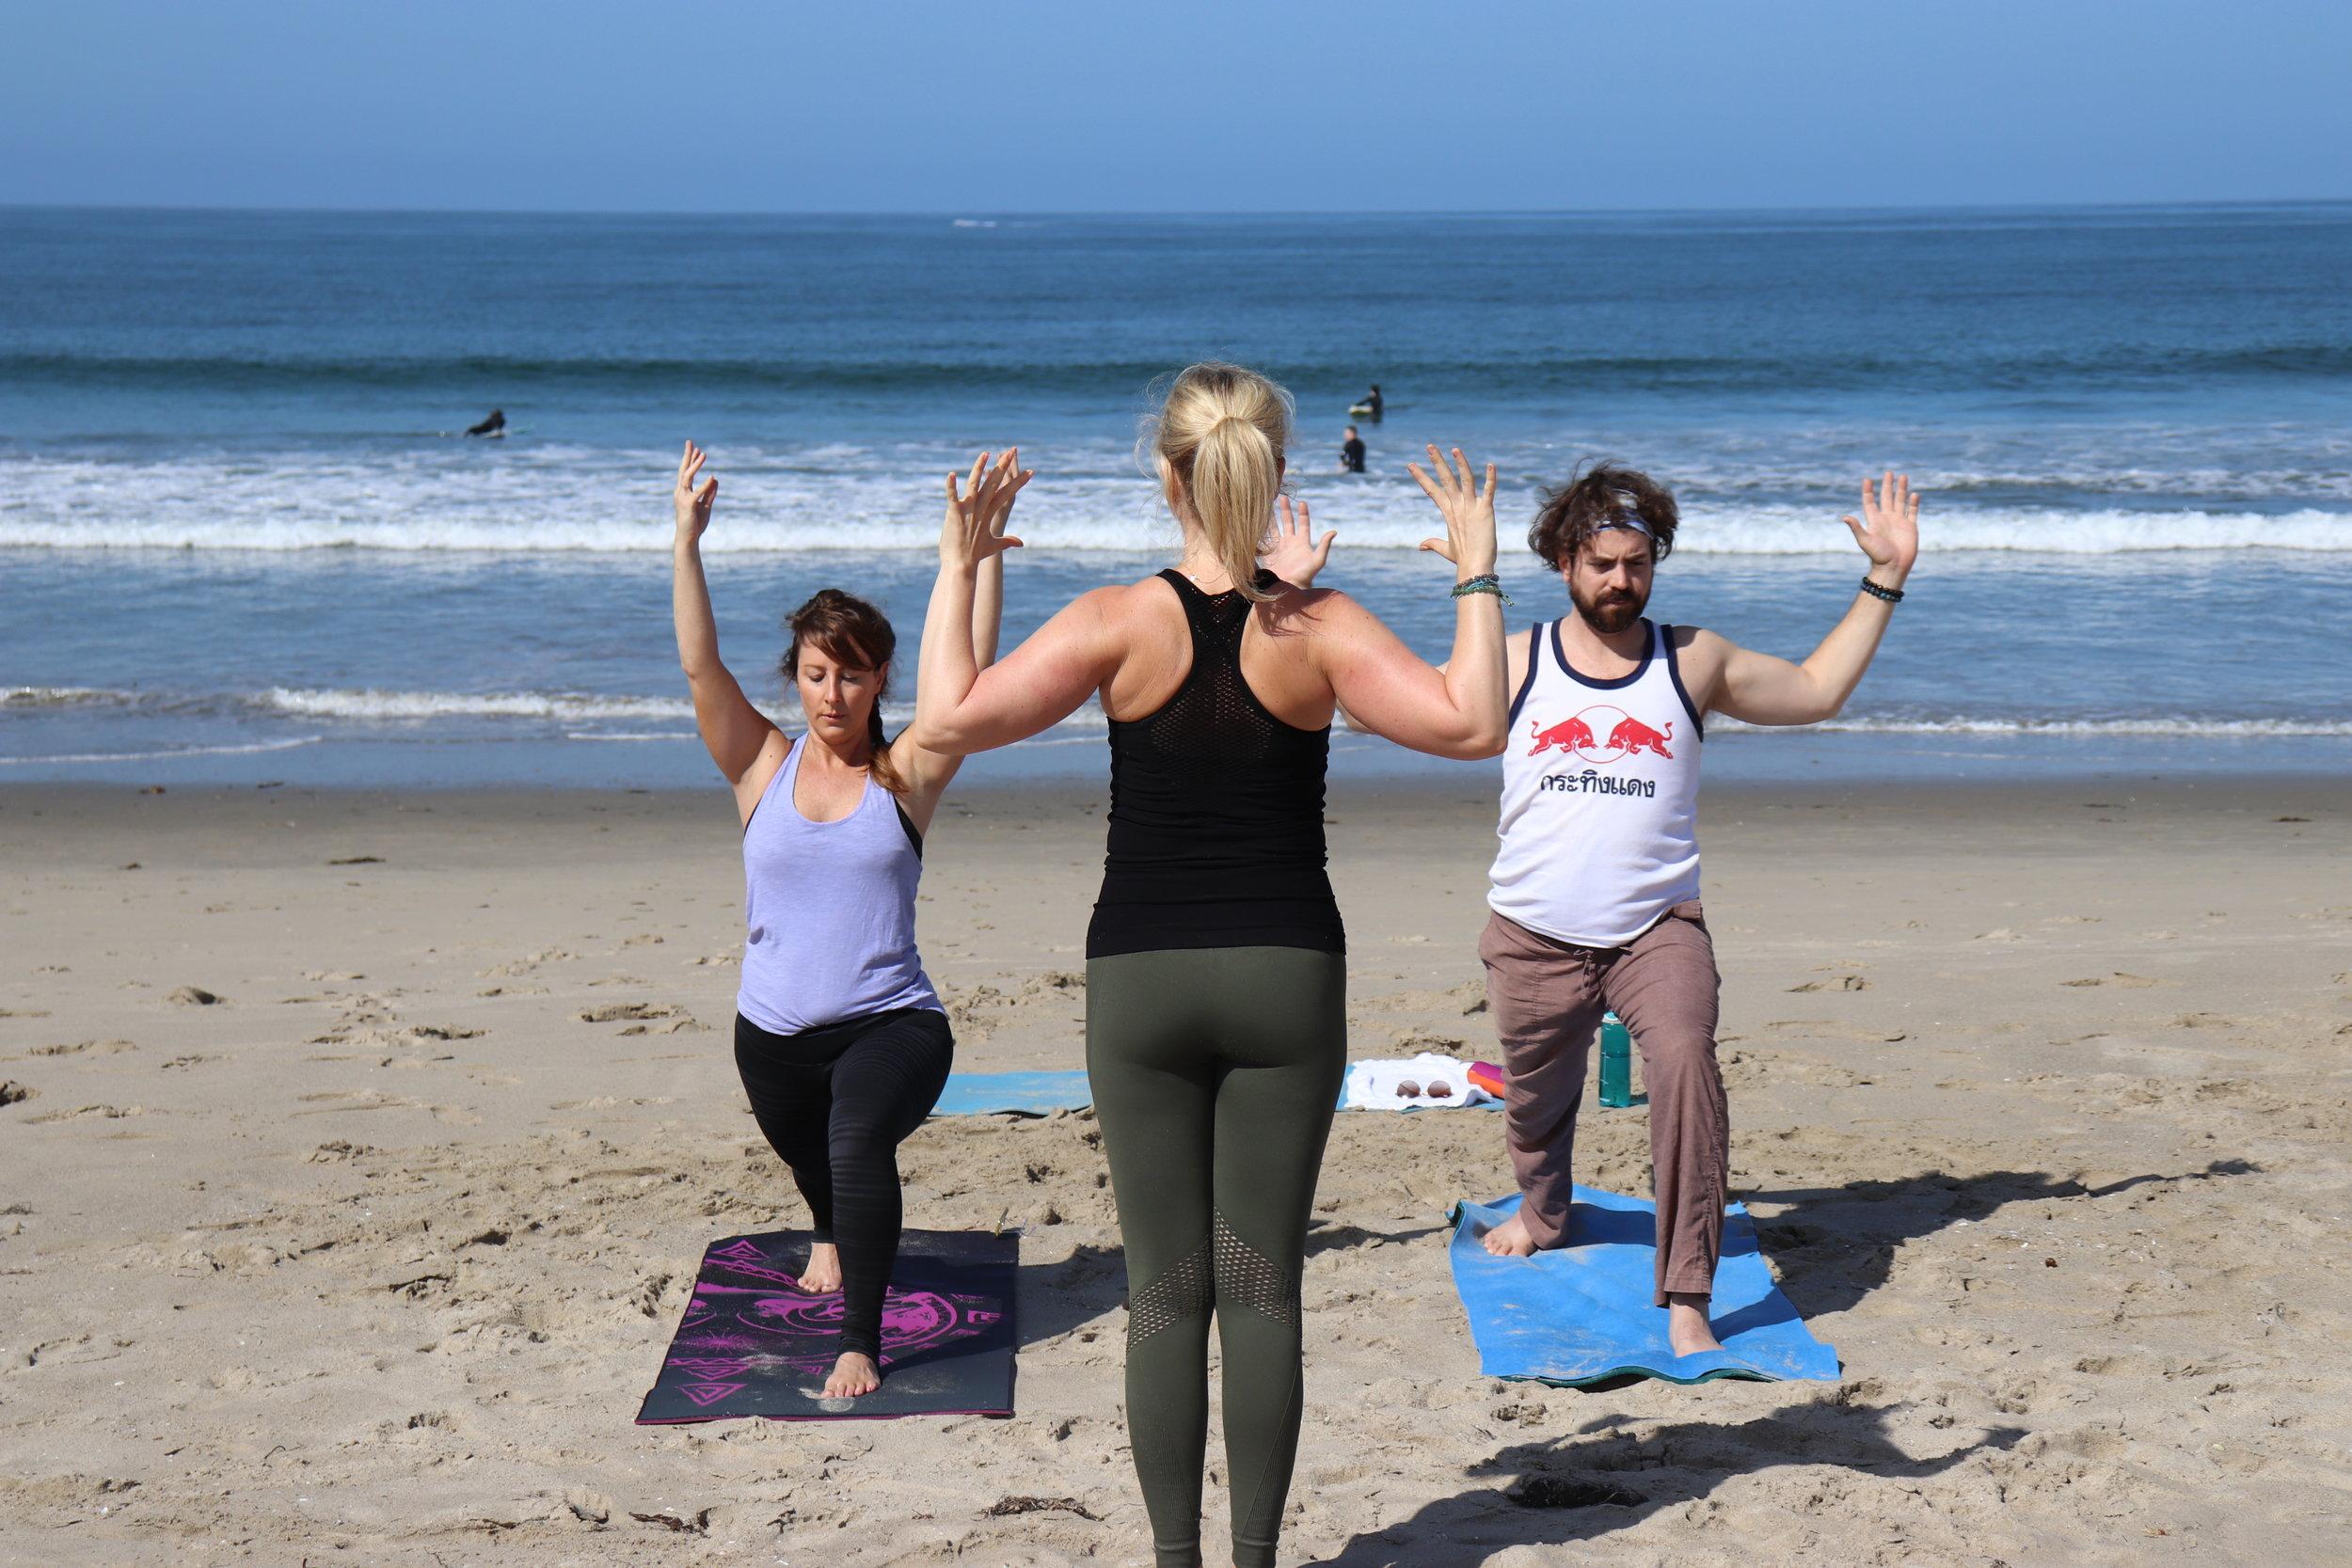 Yoga on the Beach = So many health benefits!